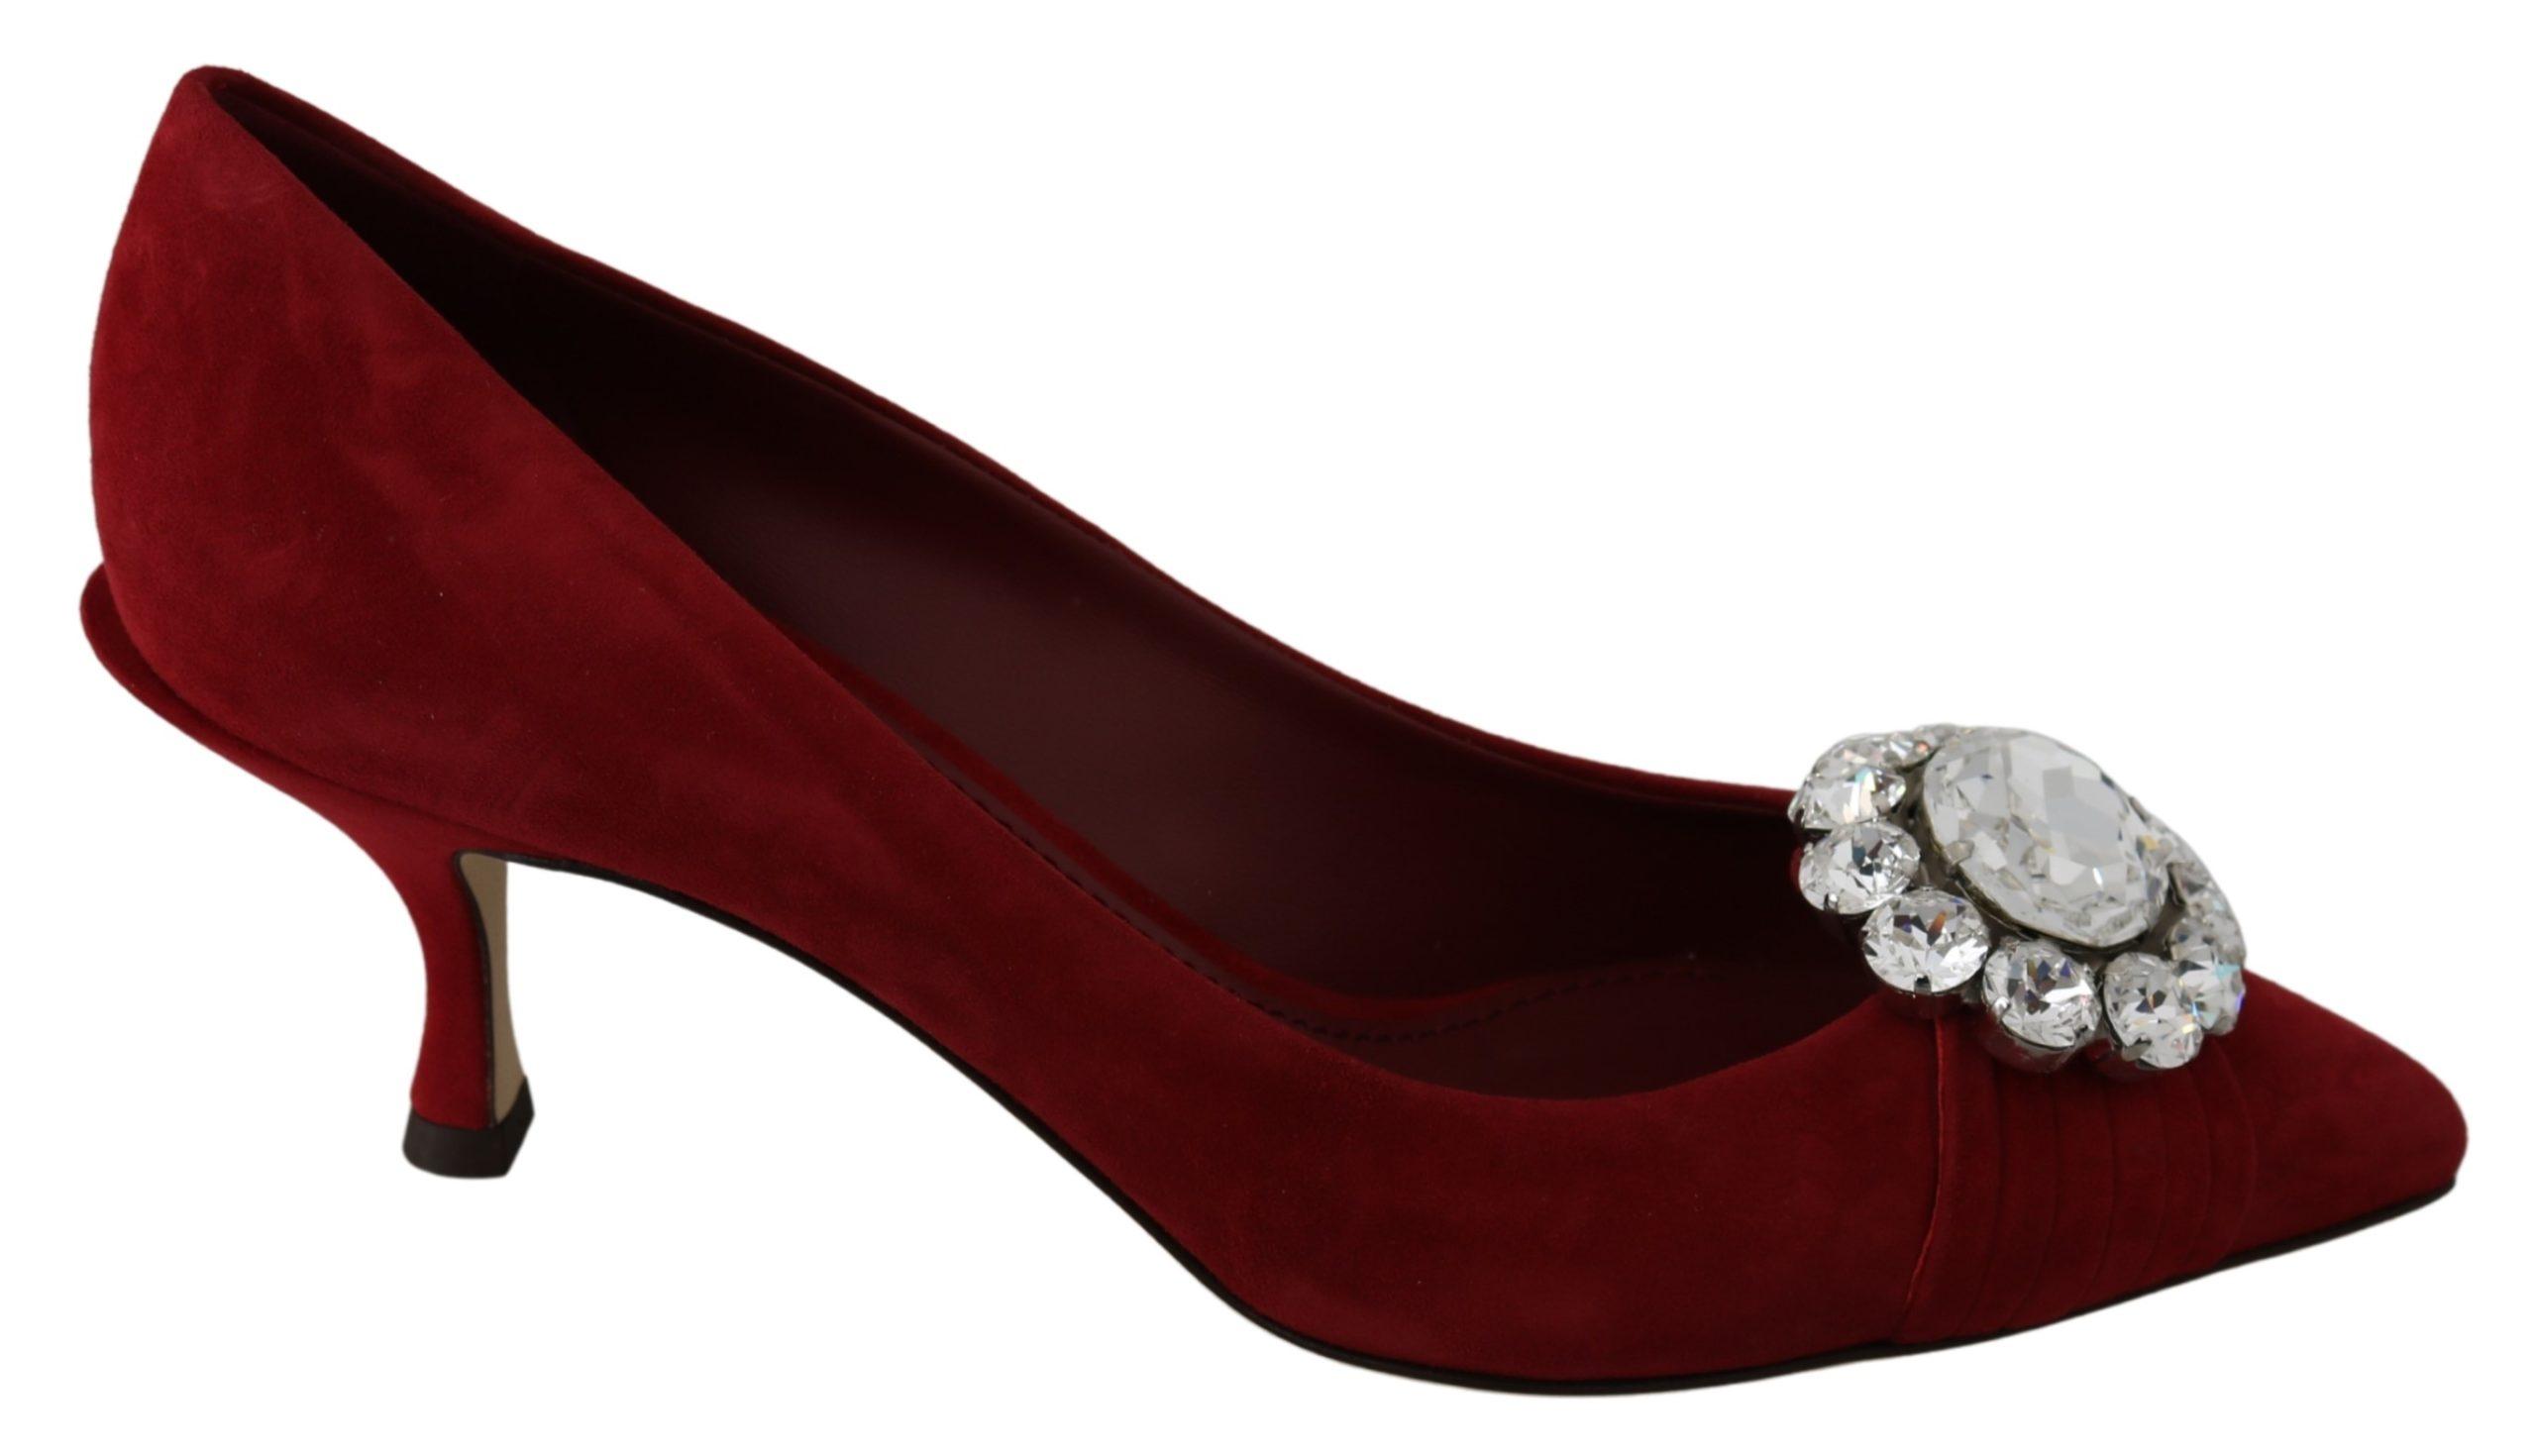 Dolce & Gabbana Women's Suede Clear Crystals Pumps Red LA7235 - EU39/US8.5